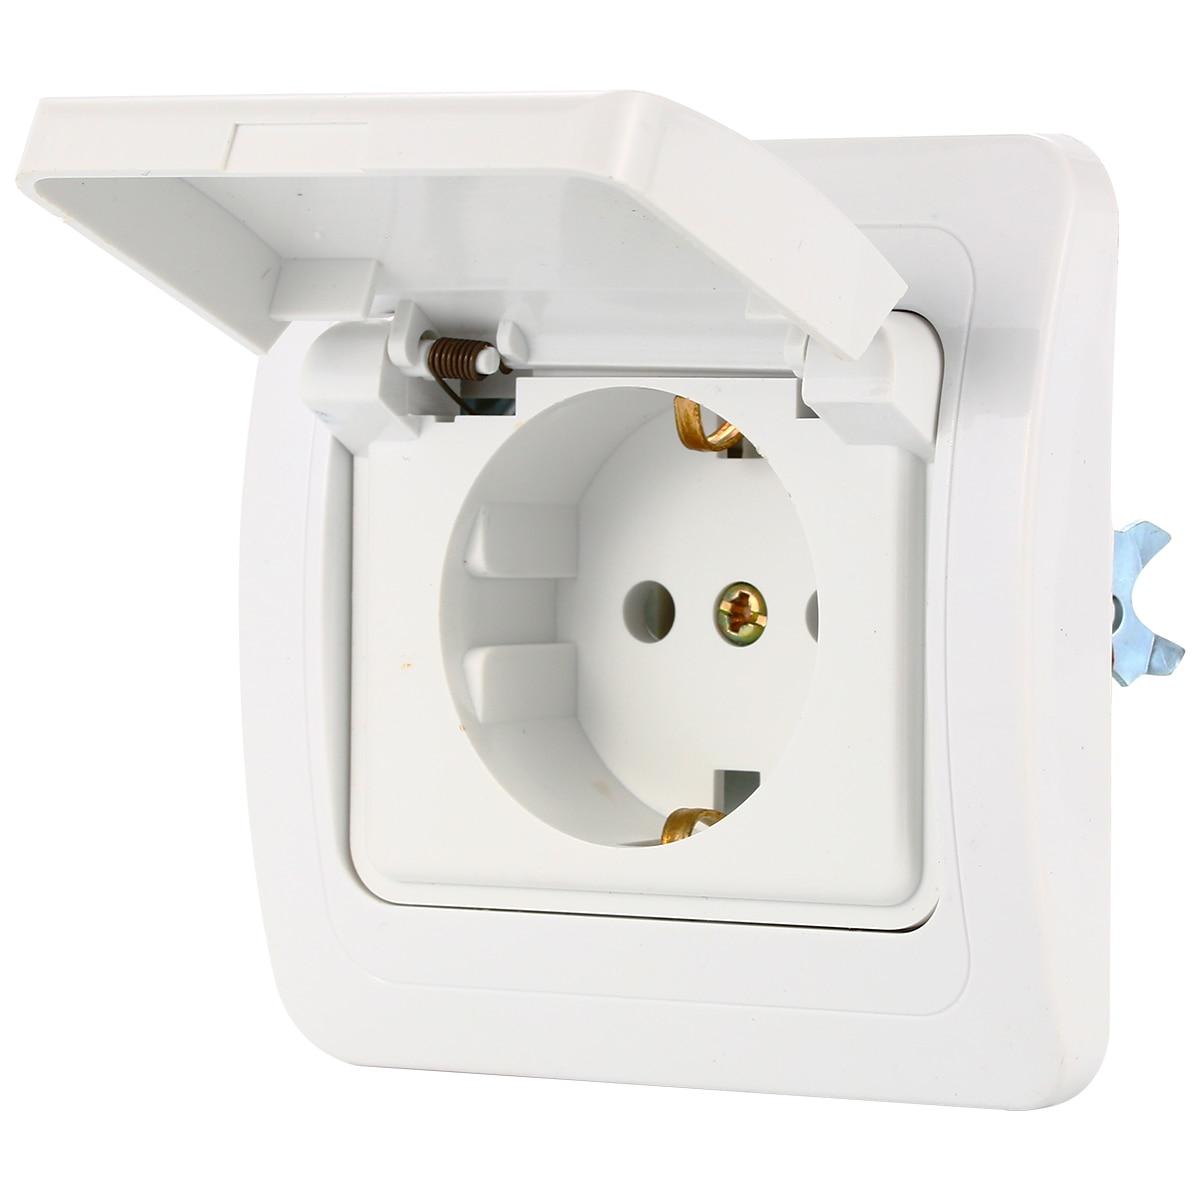 medium resolution of germany european ac power socket 16a 250v korea wiring receptacle power outlet schuko bi132 on aliexpress com alibaba group